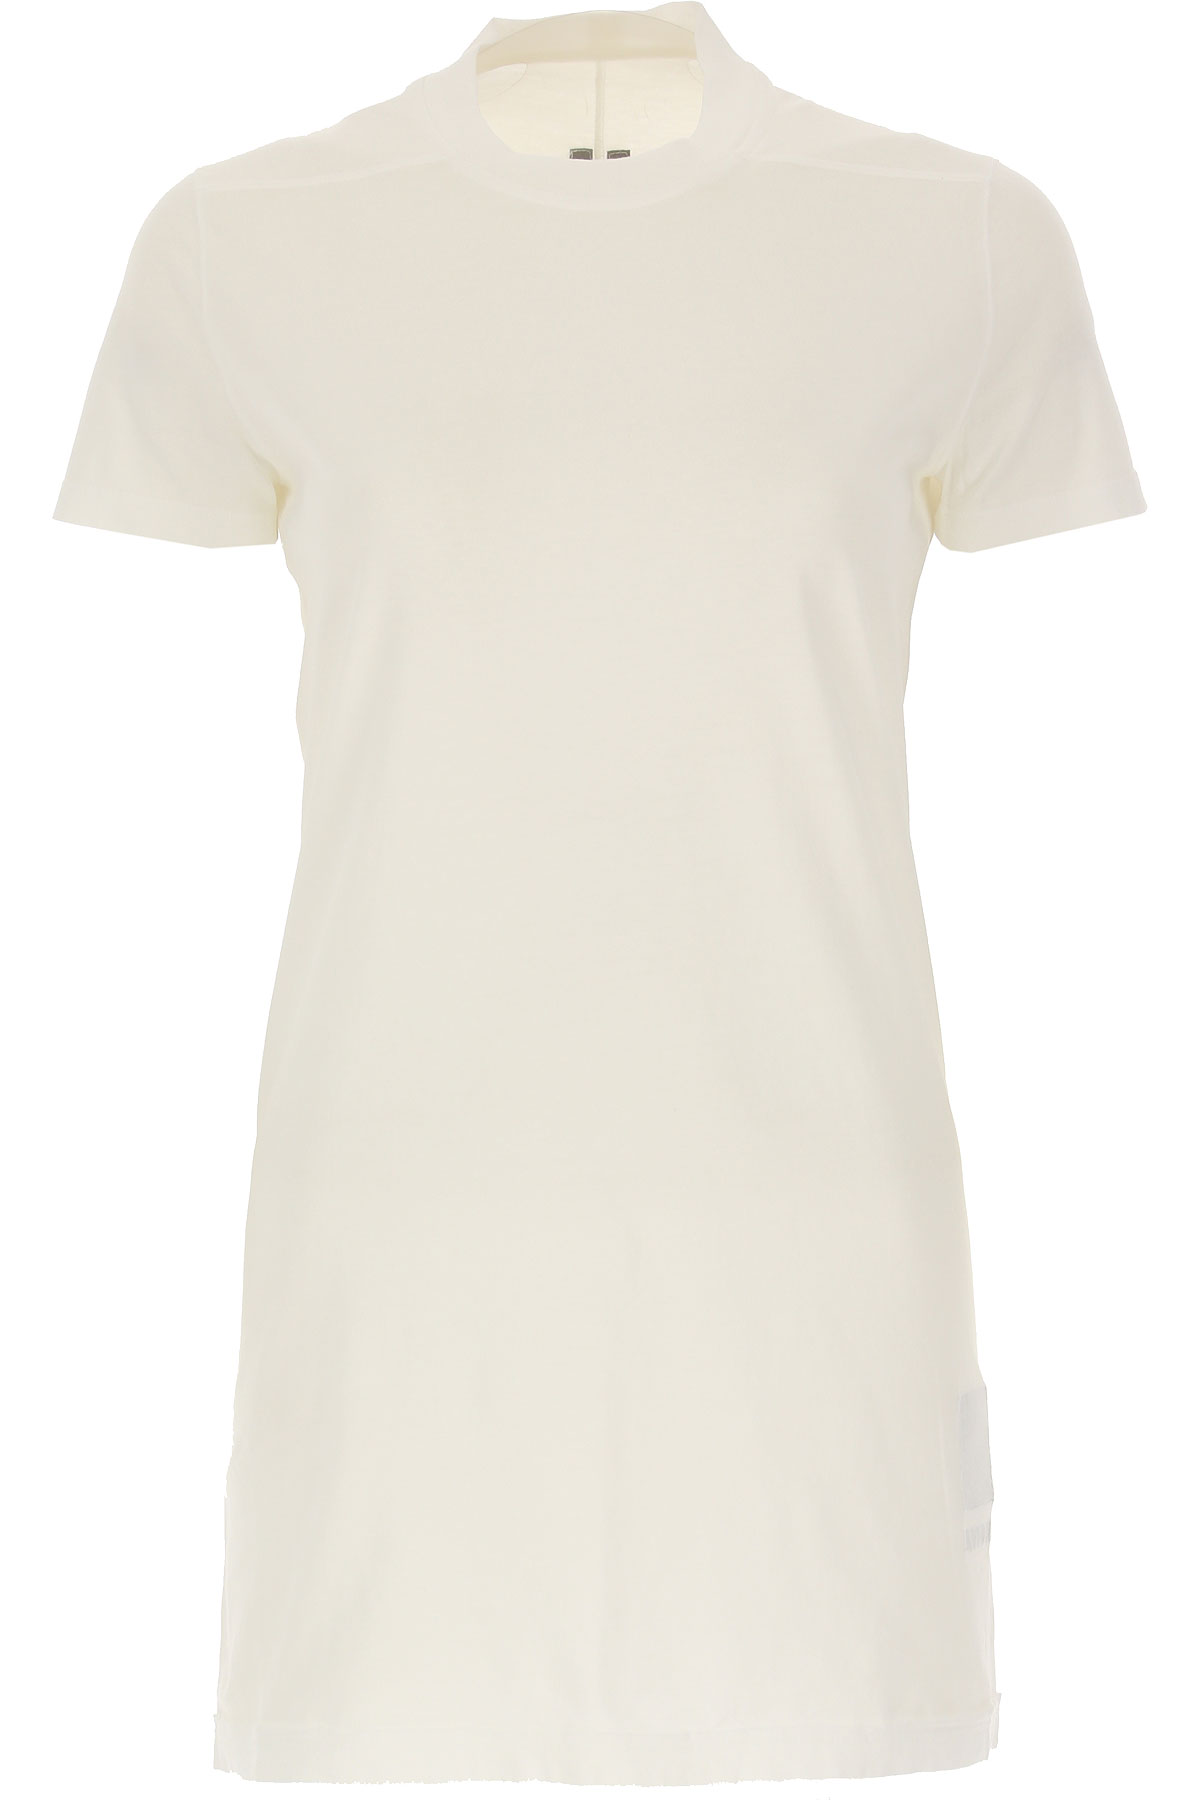 Rick Owens DRKSHDW T-Shirt for Women On Sale, White, Cotton, 2019, 2 4